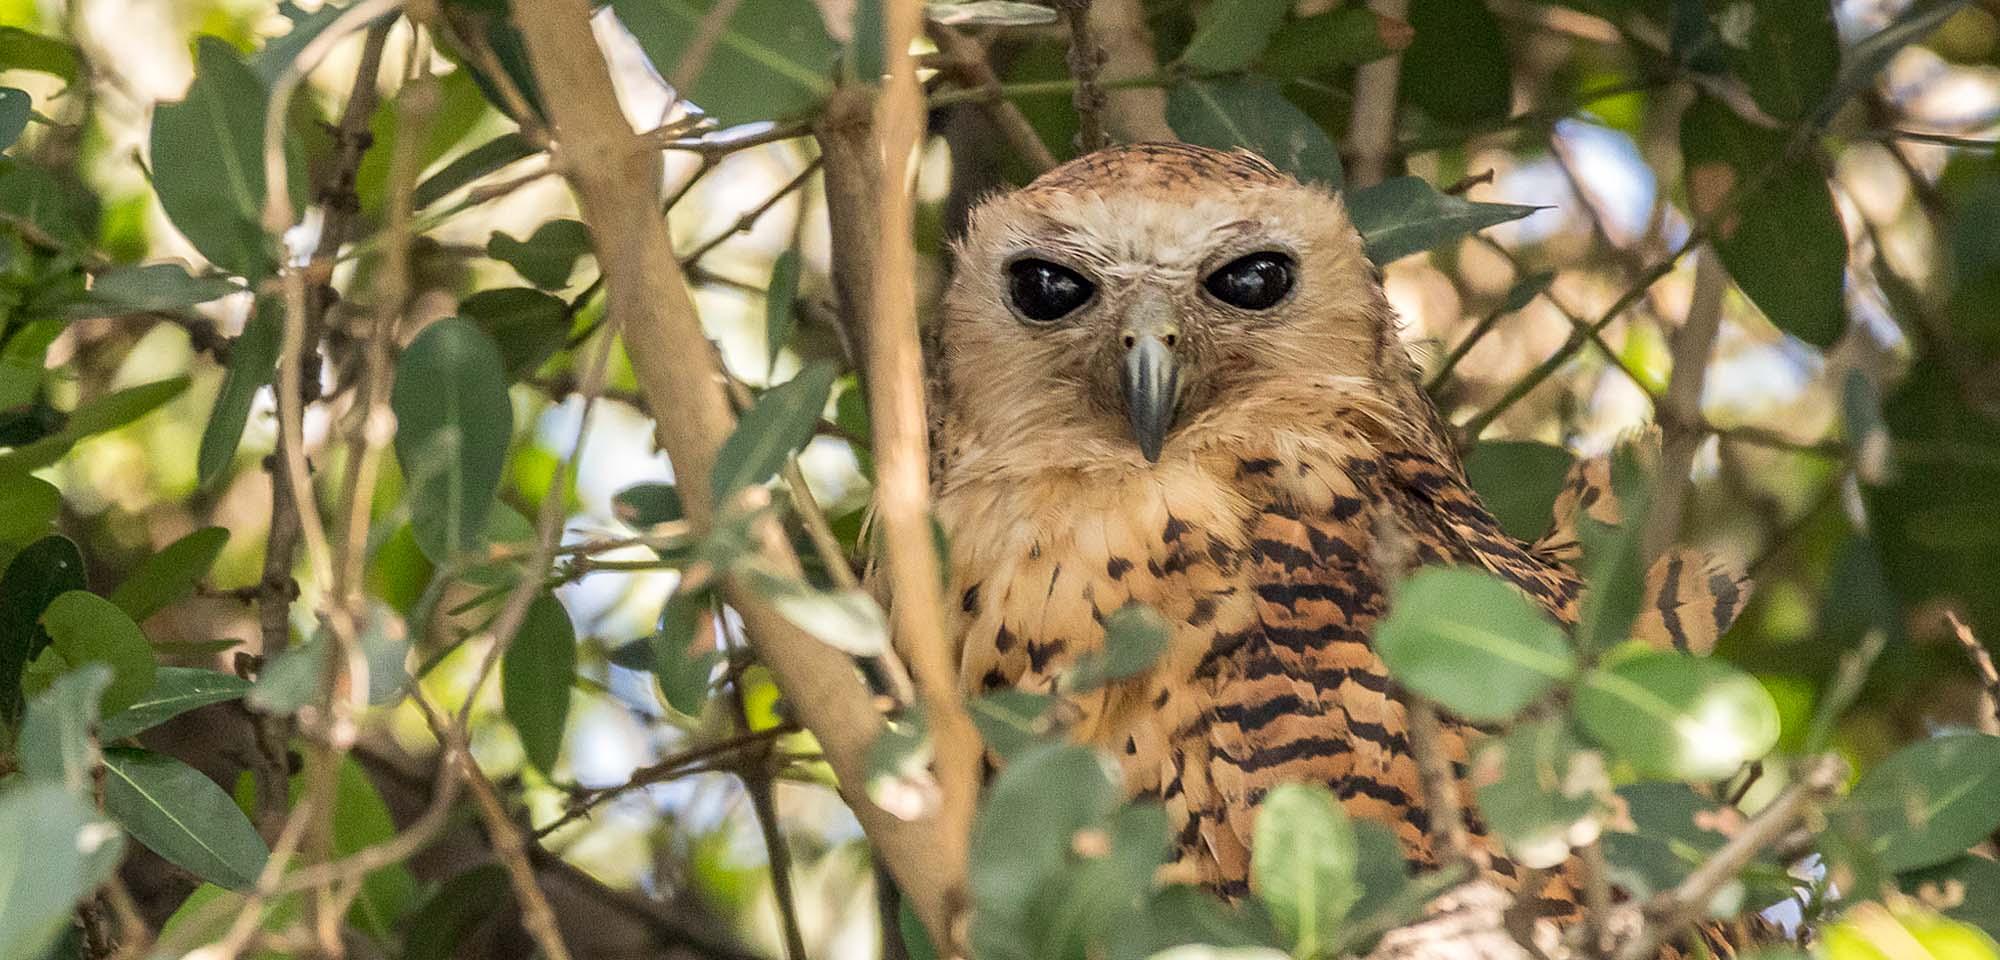 Pels Fishing-Owl Field Guides Birding Tours Namibia Botswana